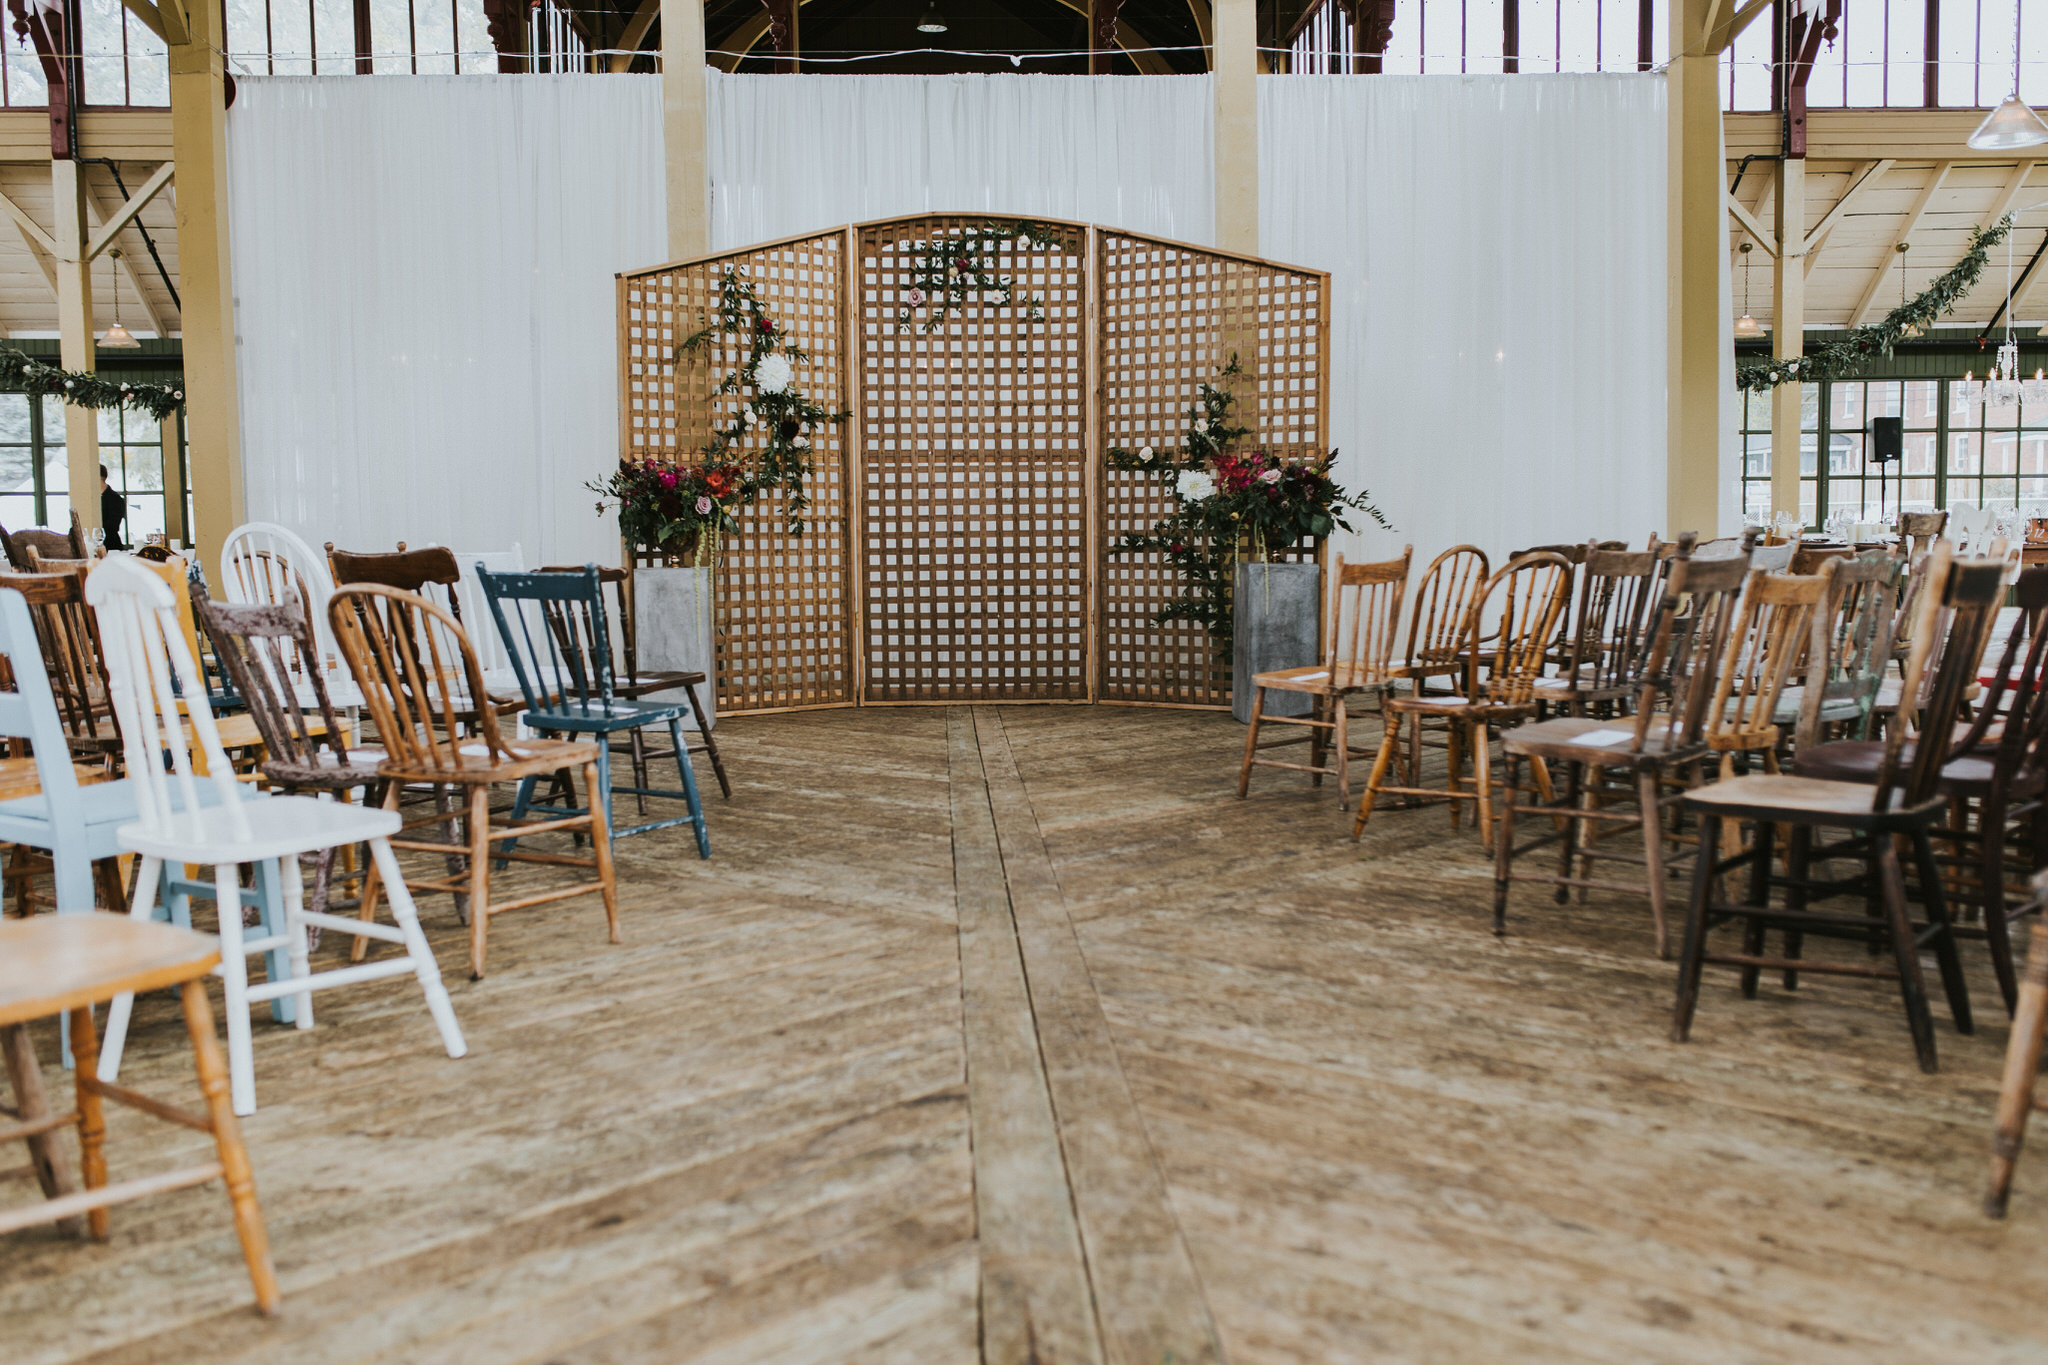 scarletoneillphotography_weddingphotography_prince edward county weddings073.JPG